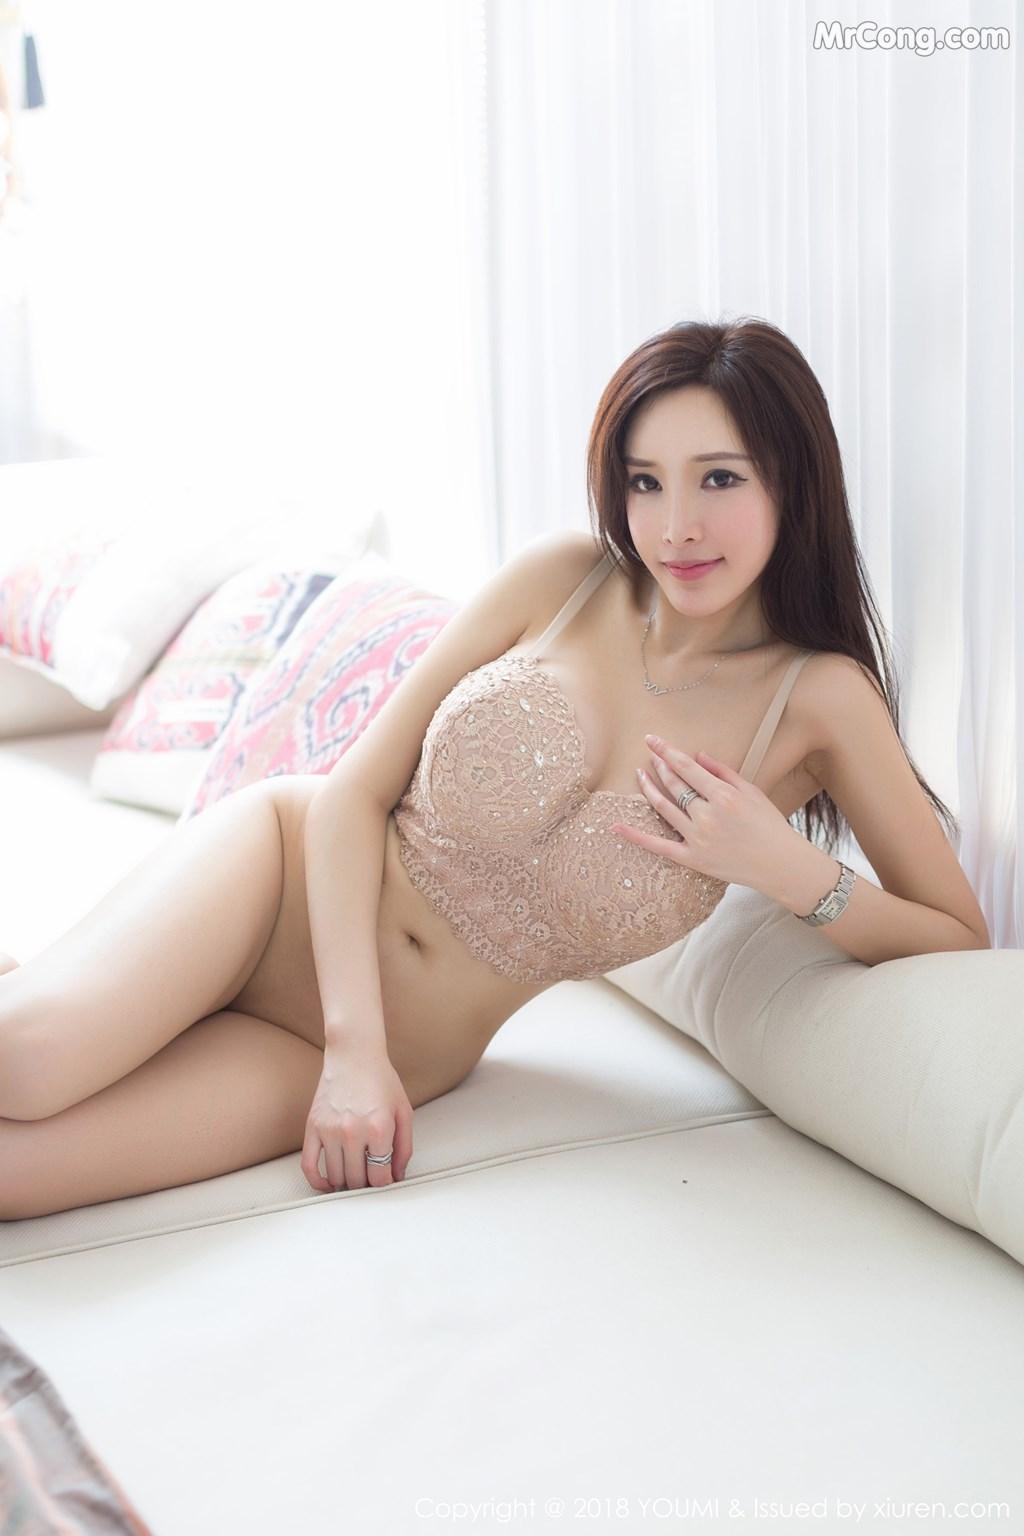 Image YouMi-Vol.197-Tu-Fei-Yuan-Ai-Cuo-Qiong-MrCong.com-008 in post YouMi Vol.197: Người mẫu 奶瓶土肥圆 (48 ảnh)